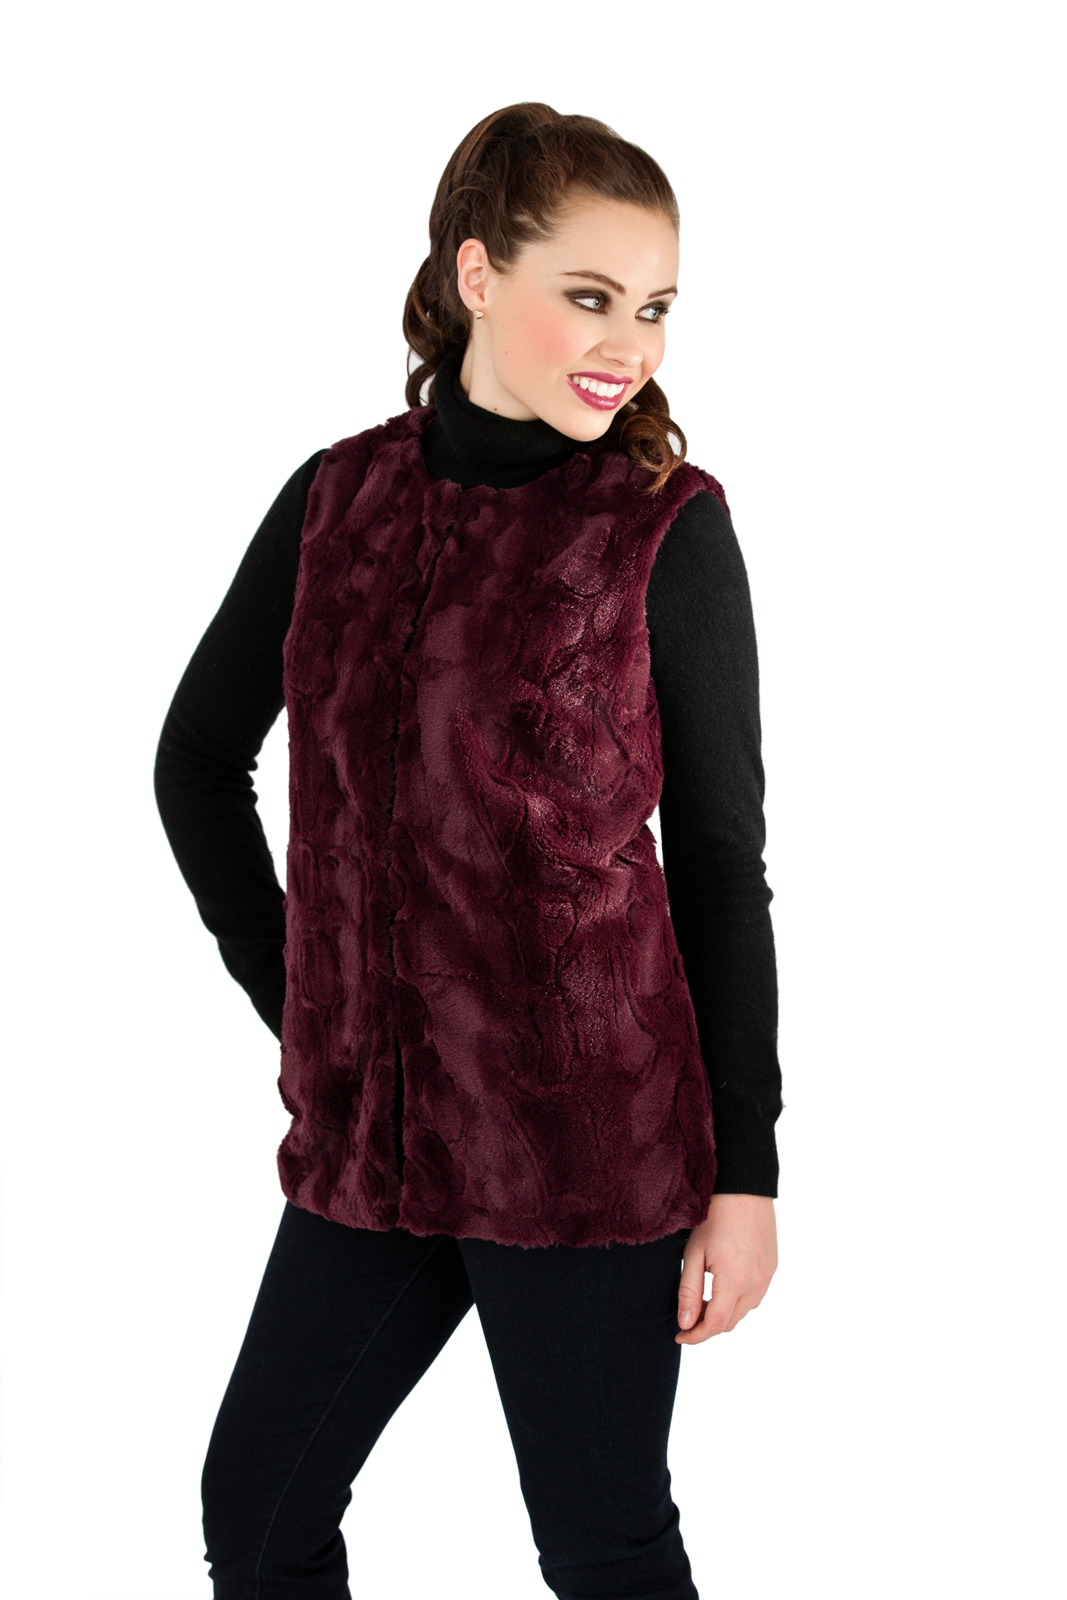 Knitting Pattern Ladies Gilet : Ladies Sleeveless Knitted Waistcoat - Bronze Cardigan